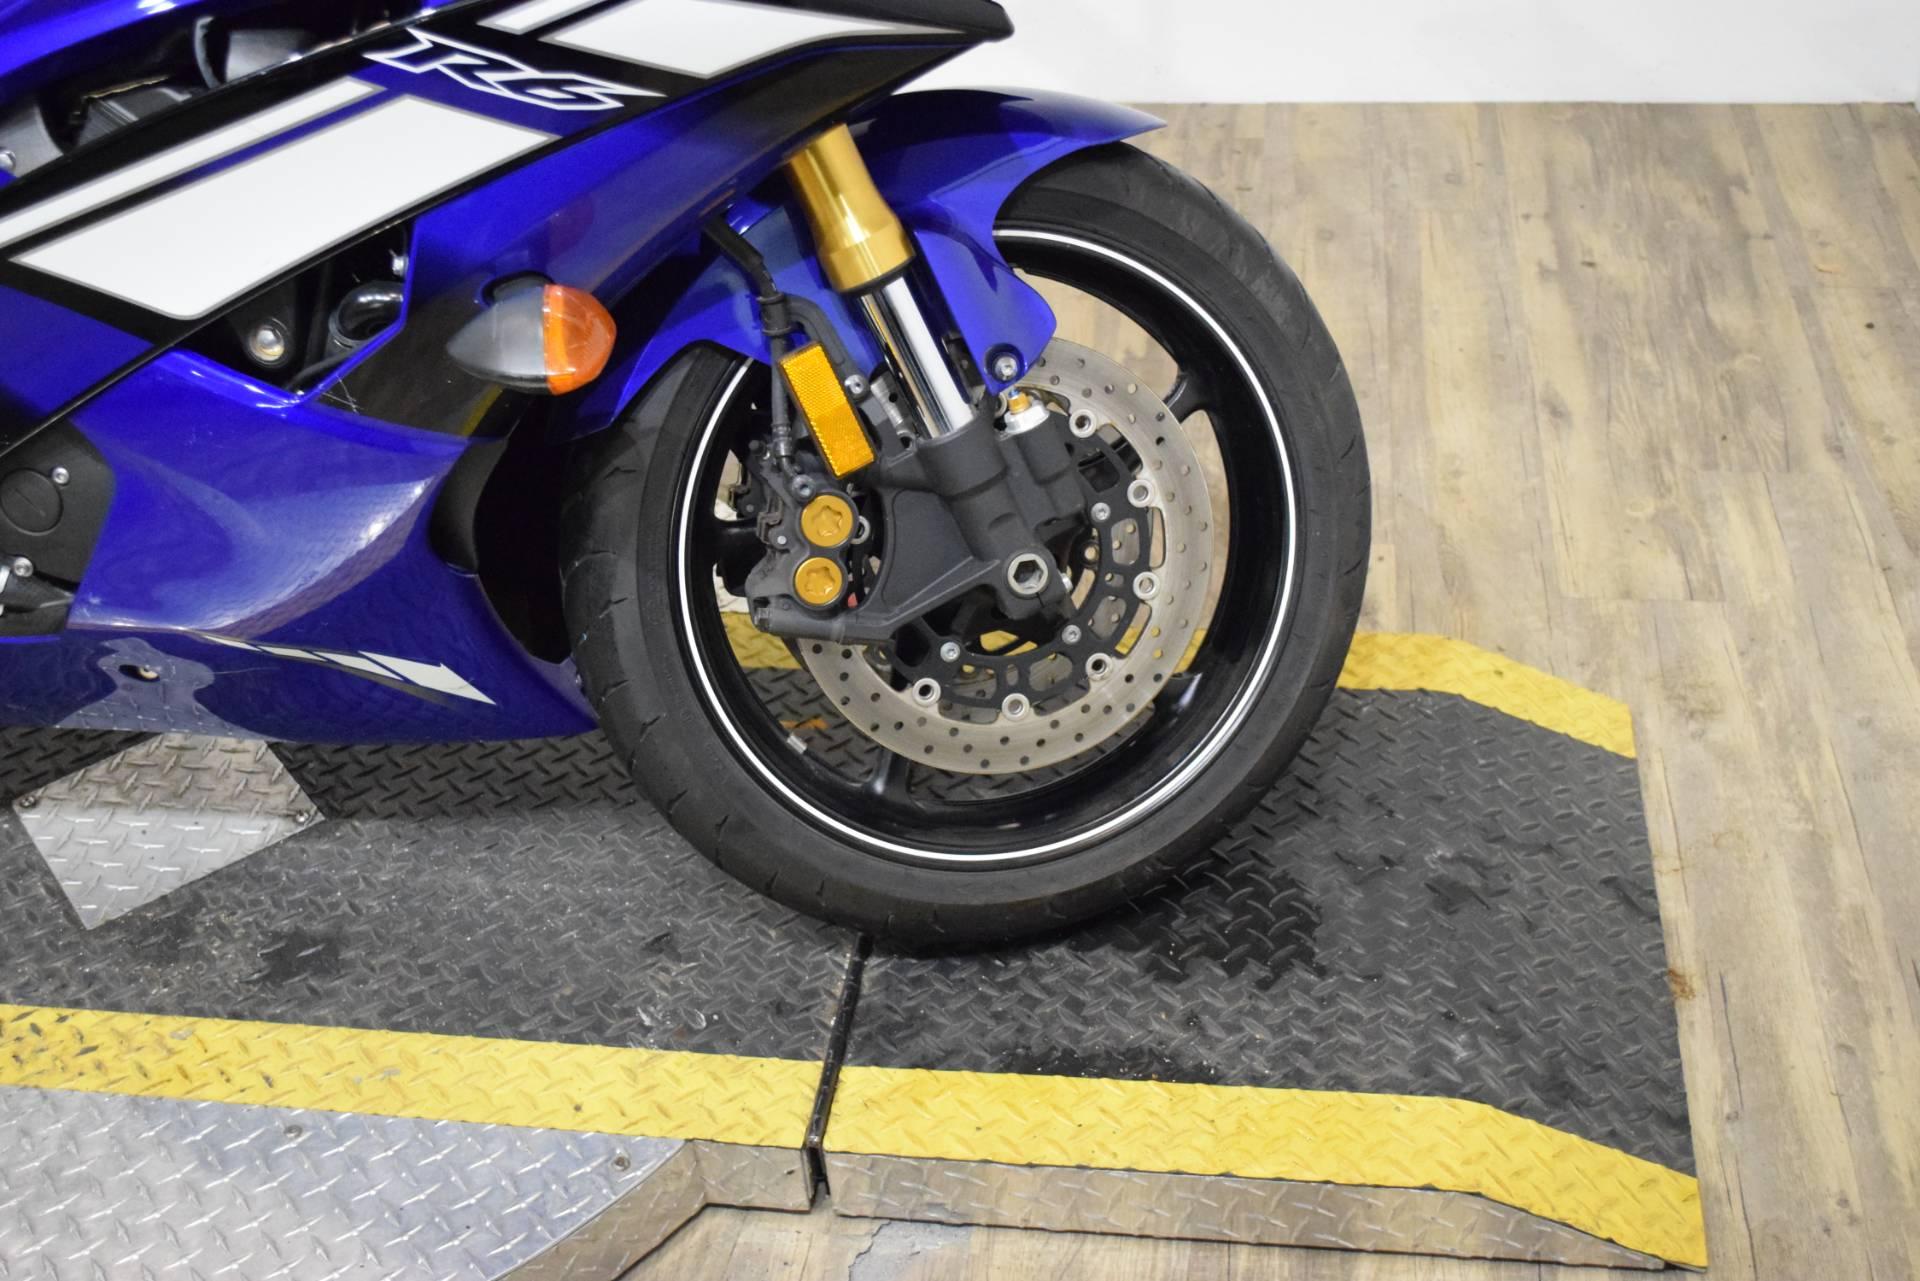 2012 Yamaha YZF R6 2